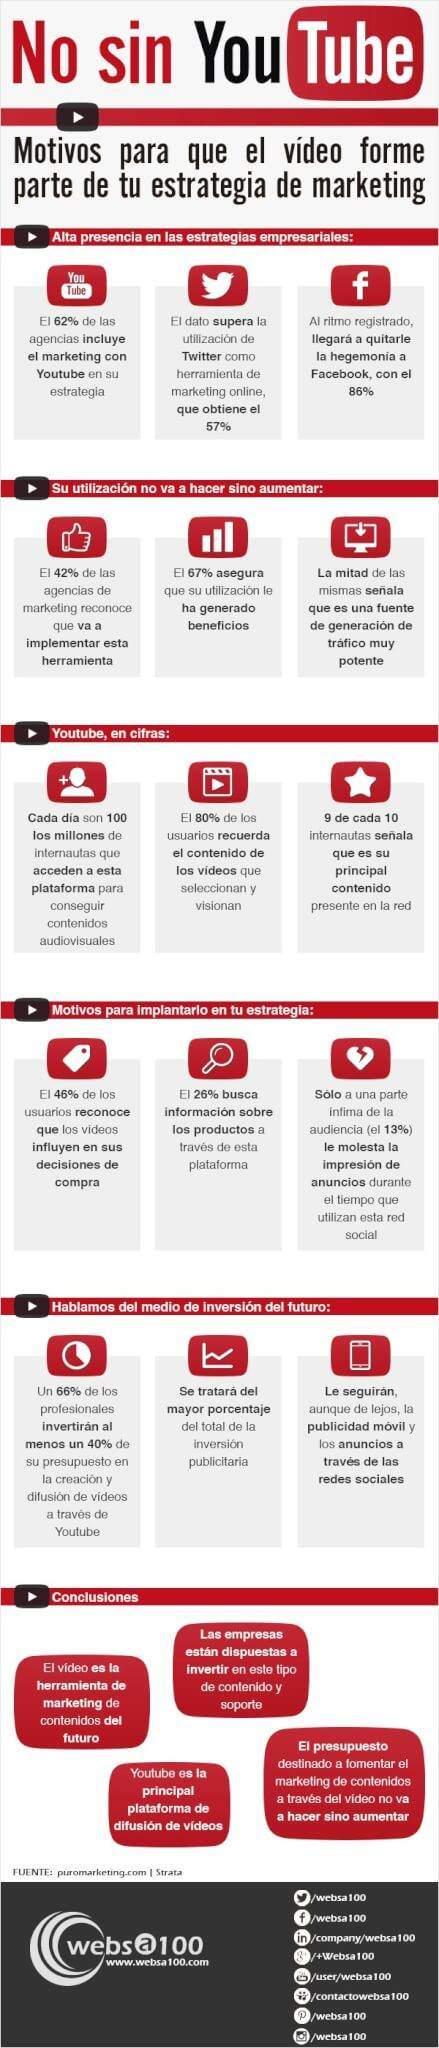 infografia-video_marketing